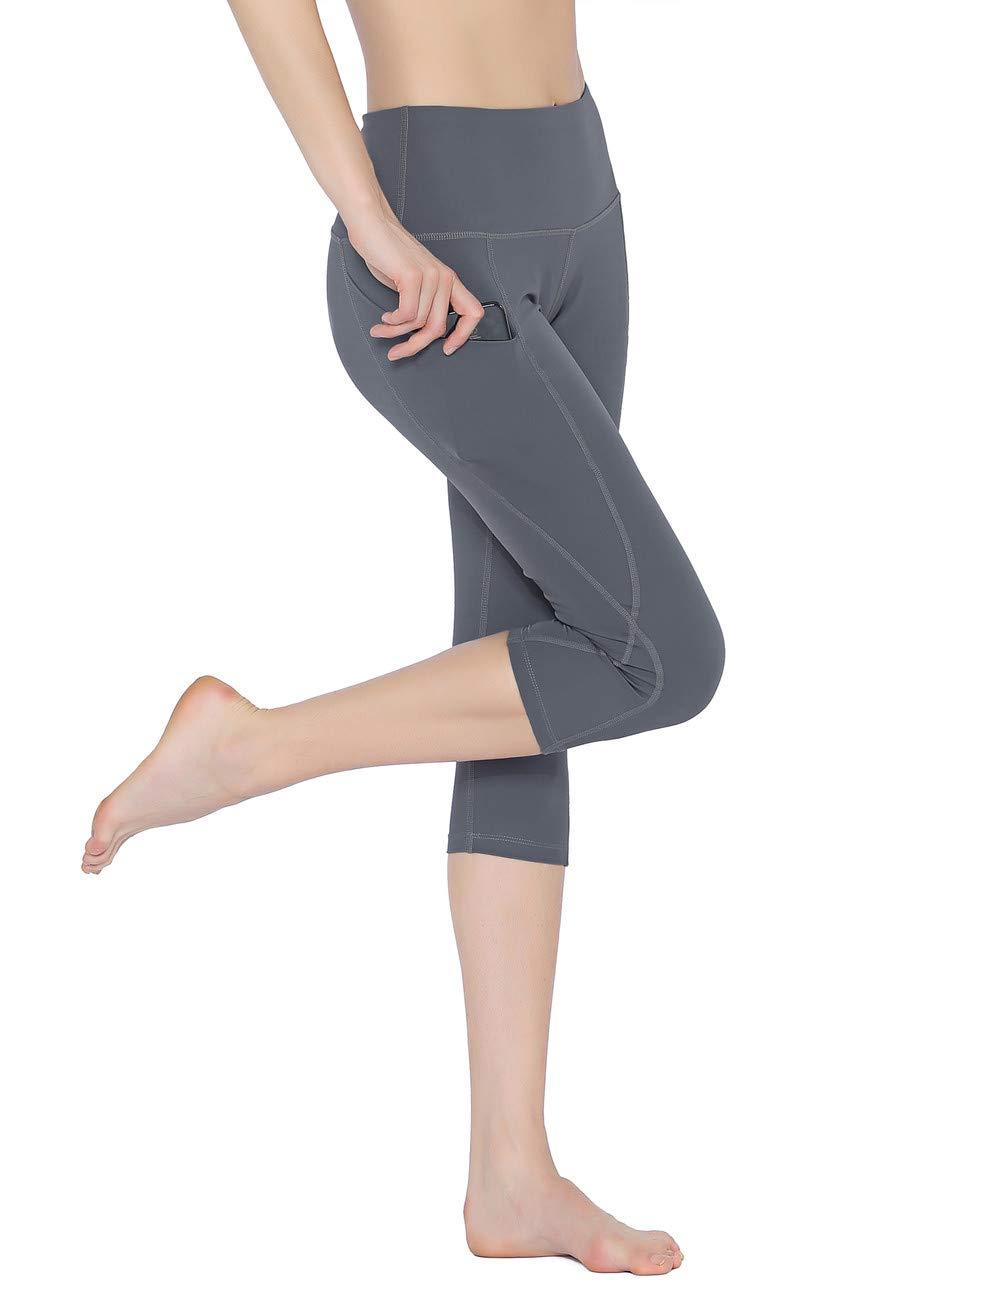 Rocorose Women Yoga Pants Side Pockets Slim Fit Stretchy Capris Workout Leggings